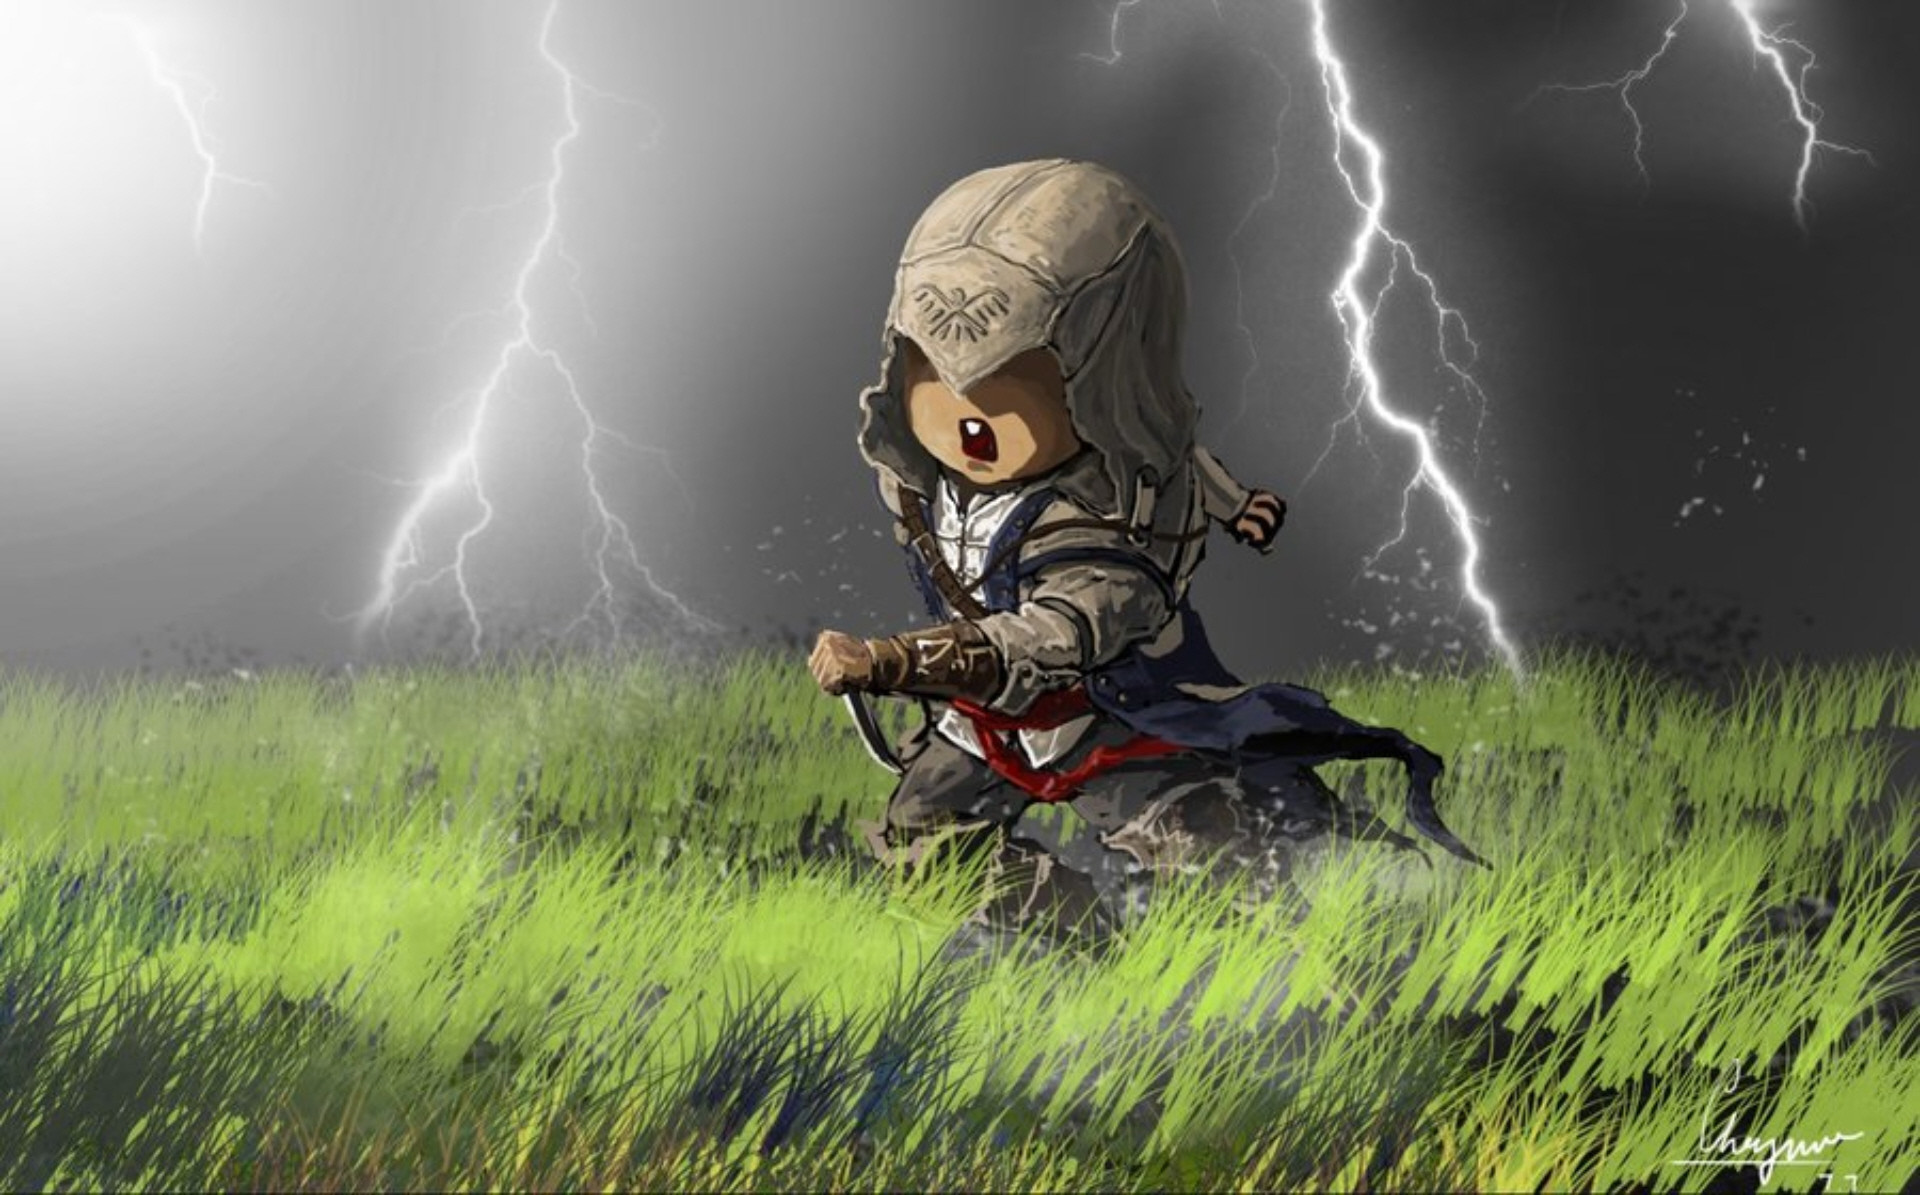 Assassin's Creed Kid Wallpaper. Sooo awesome!